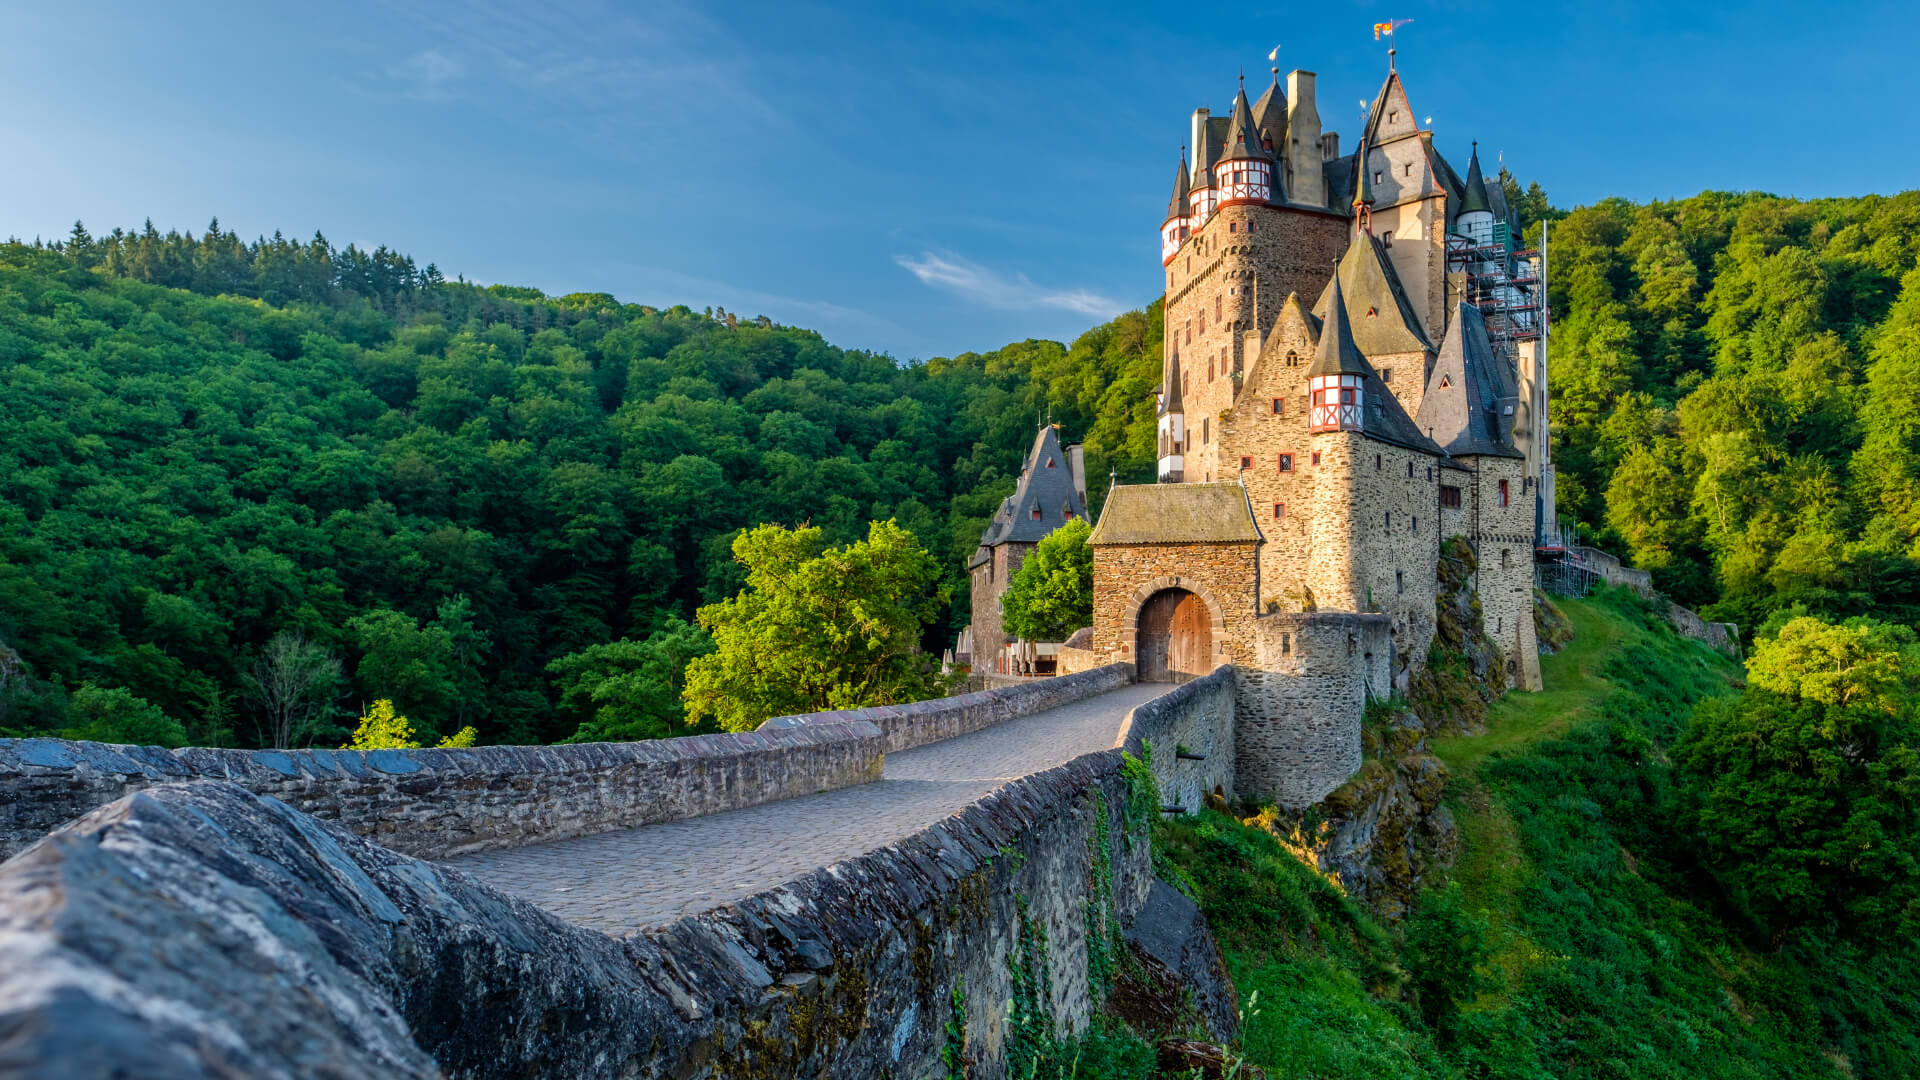 Cochem, Geierlay Köprüsü ve Burg Eltz, Almanya